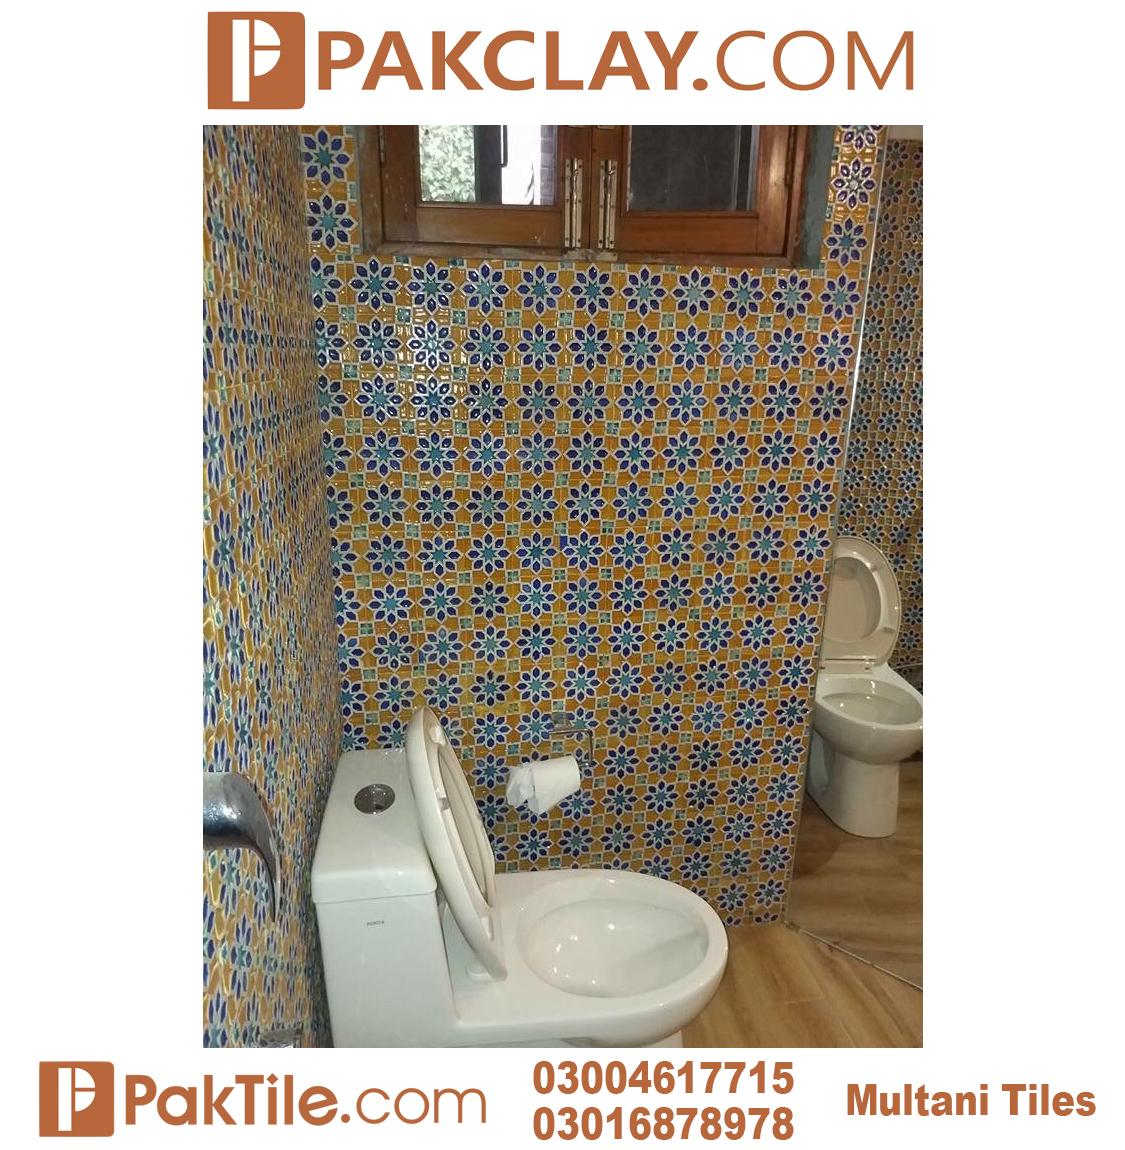 Cheap Price Toilet Blue Multani Tiles For Washroom